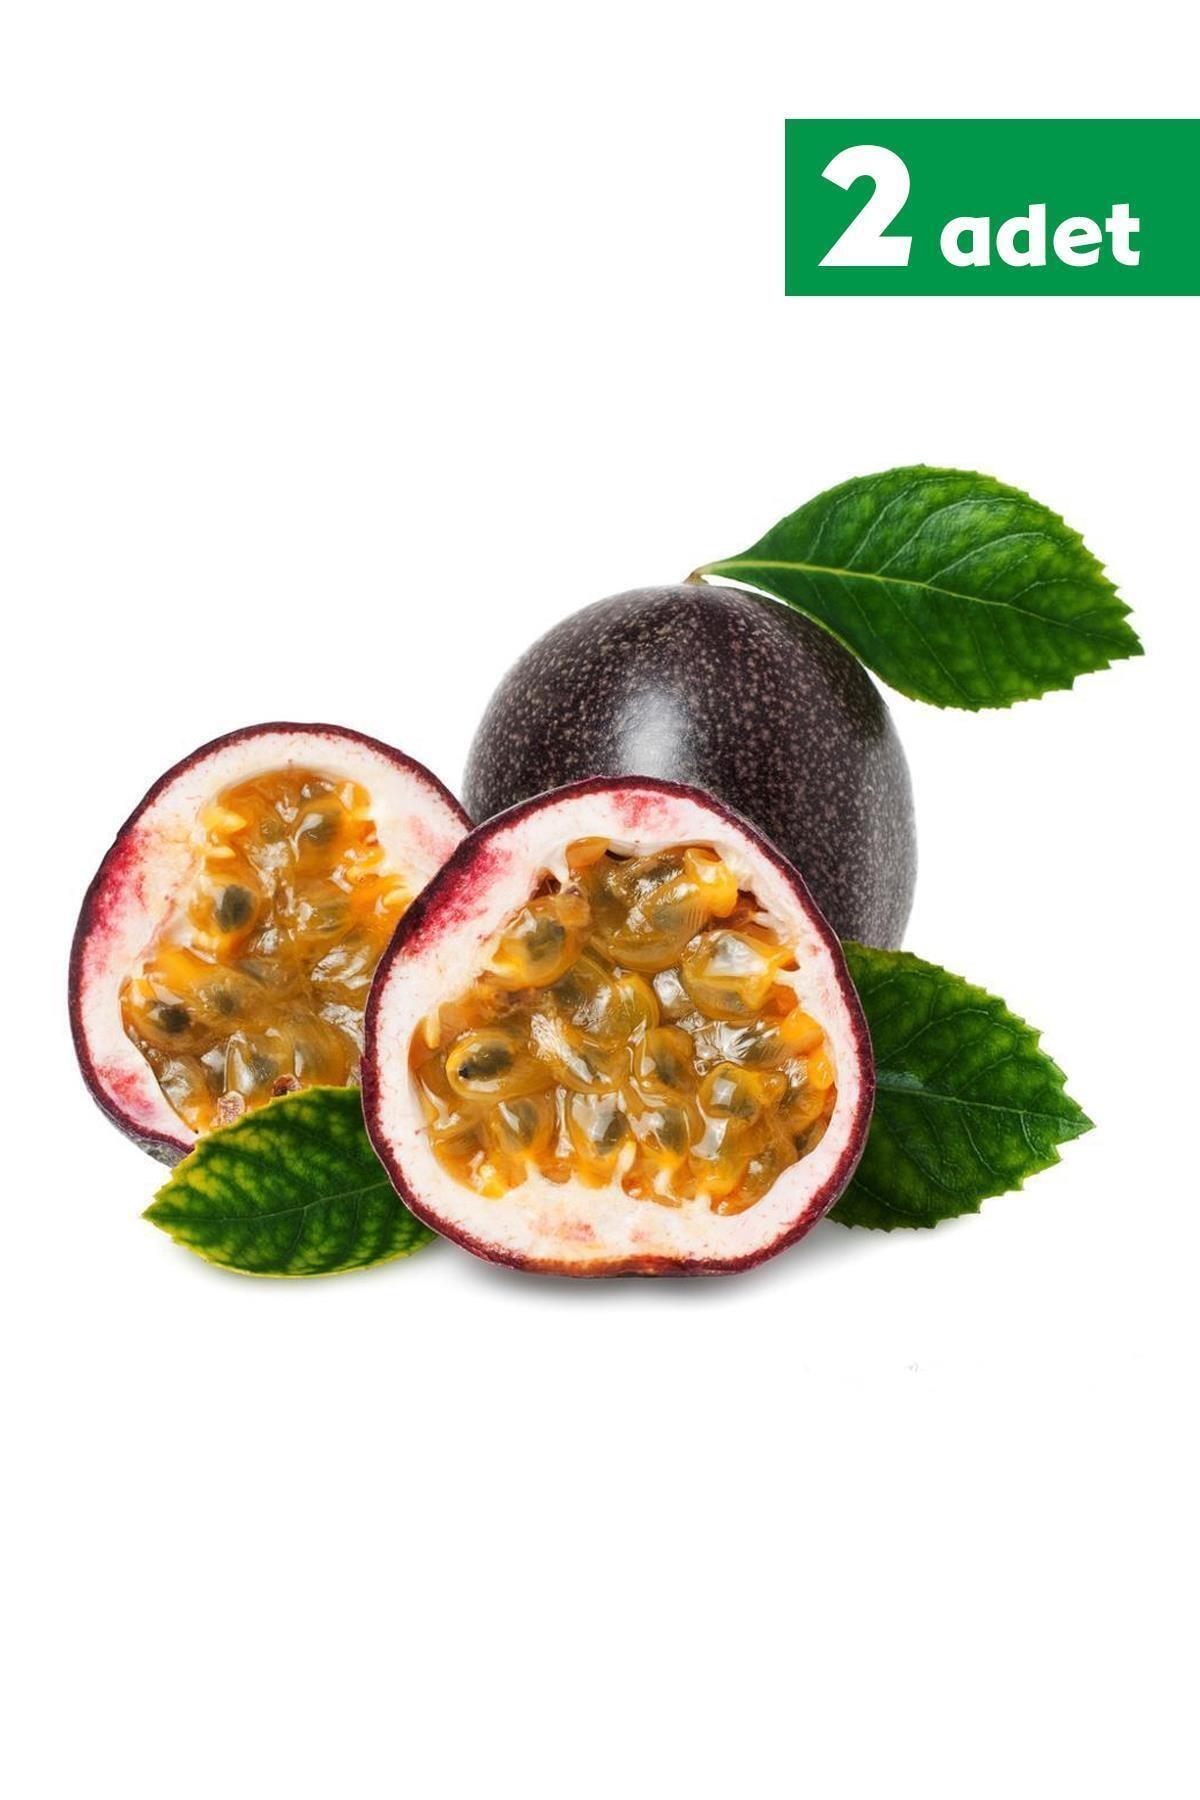 TROPİK SEPETİ Çarkıfelek (pasiflora) Meyvesi - 2 Adet 1